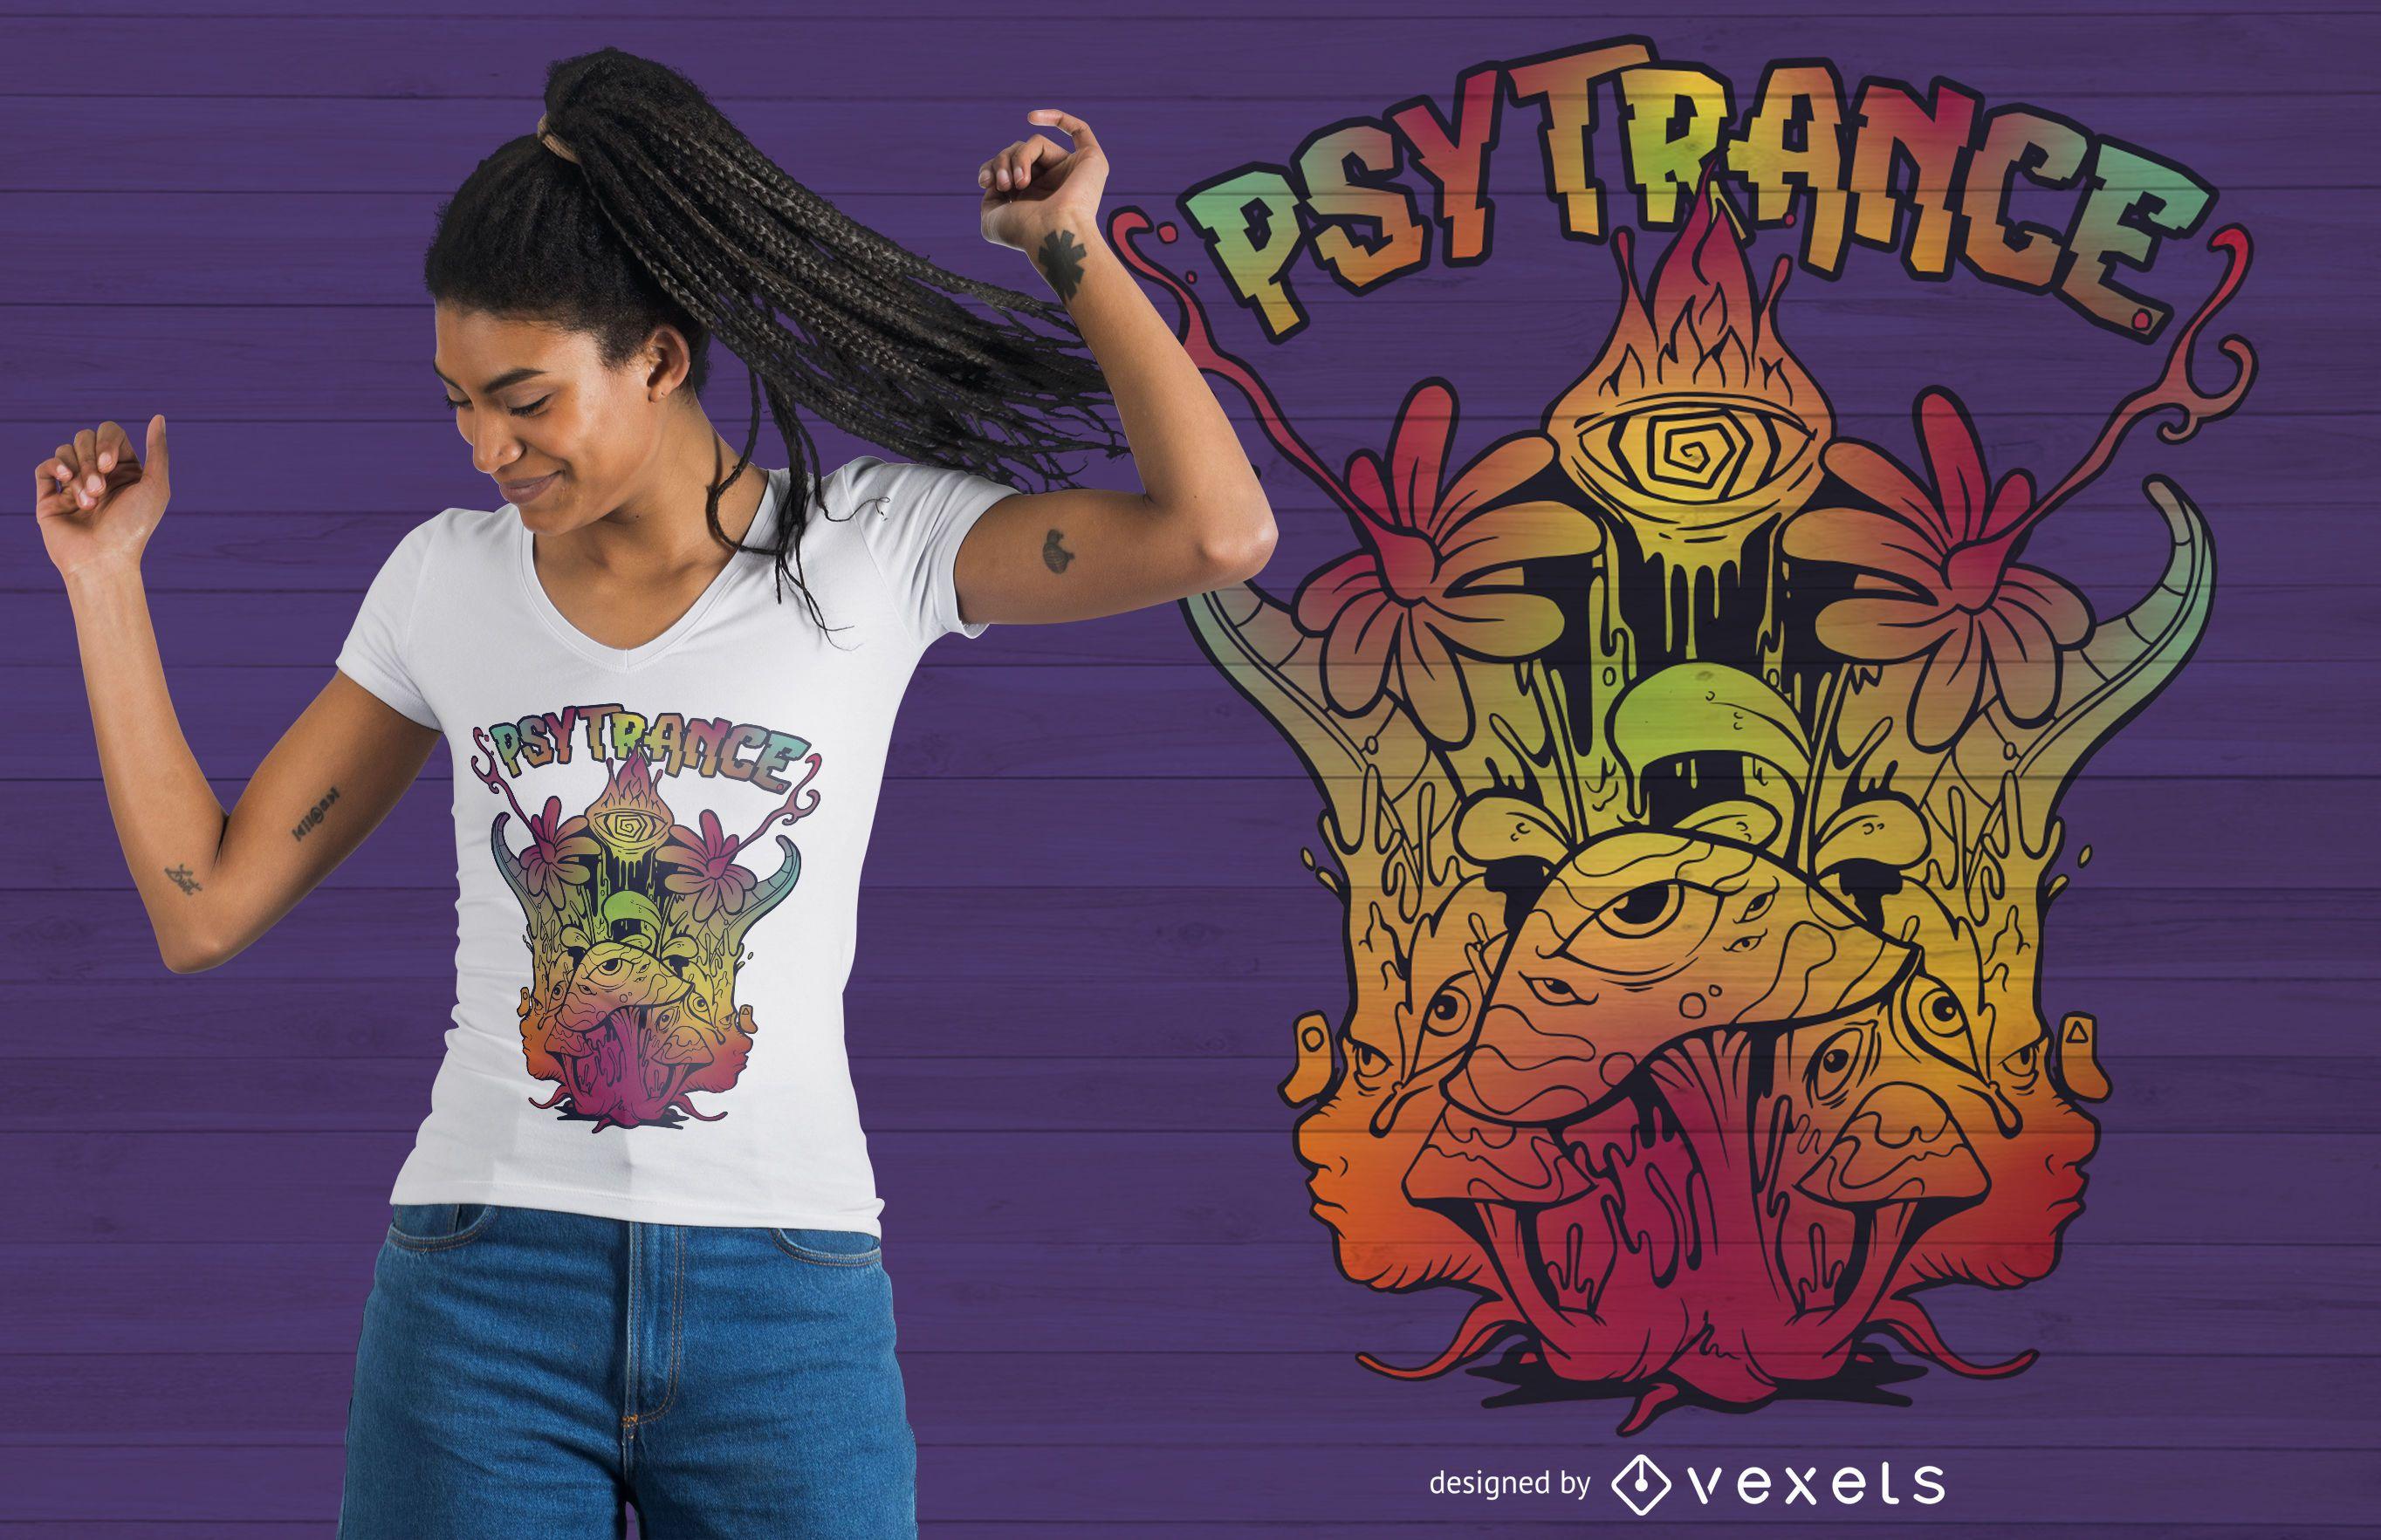 Psytrance Trippy Psychedelic T-shirt Design